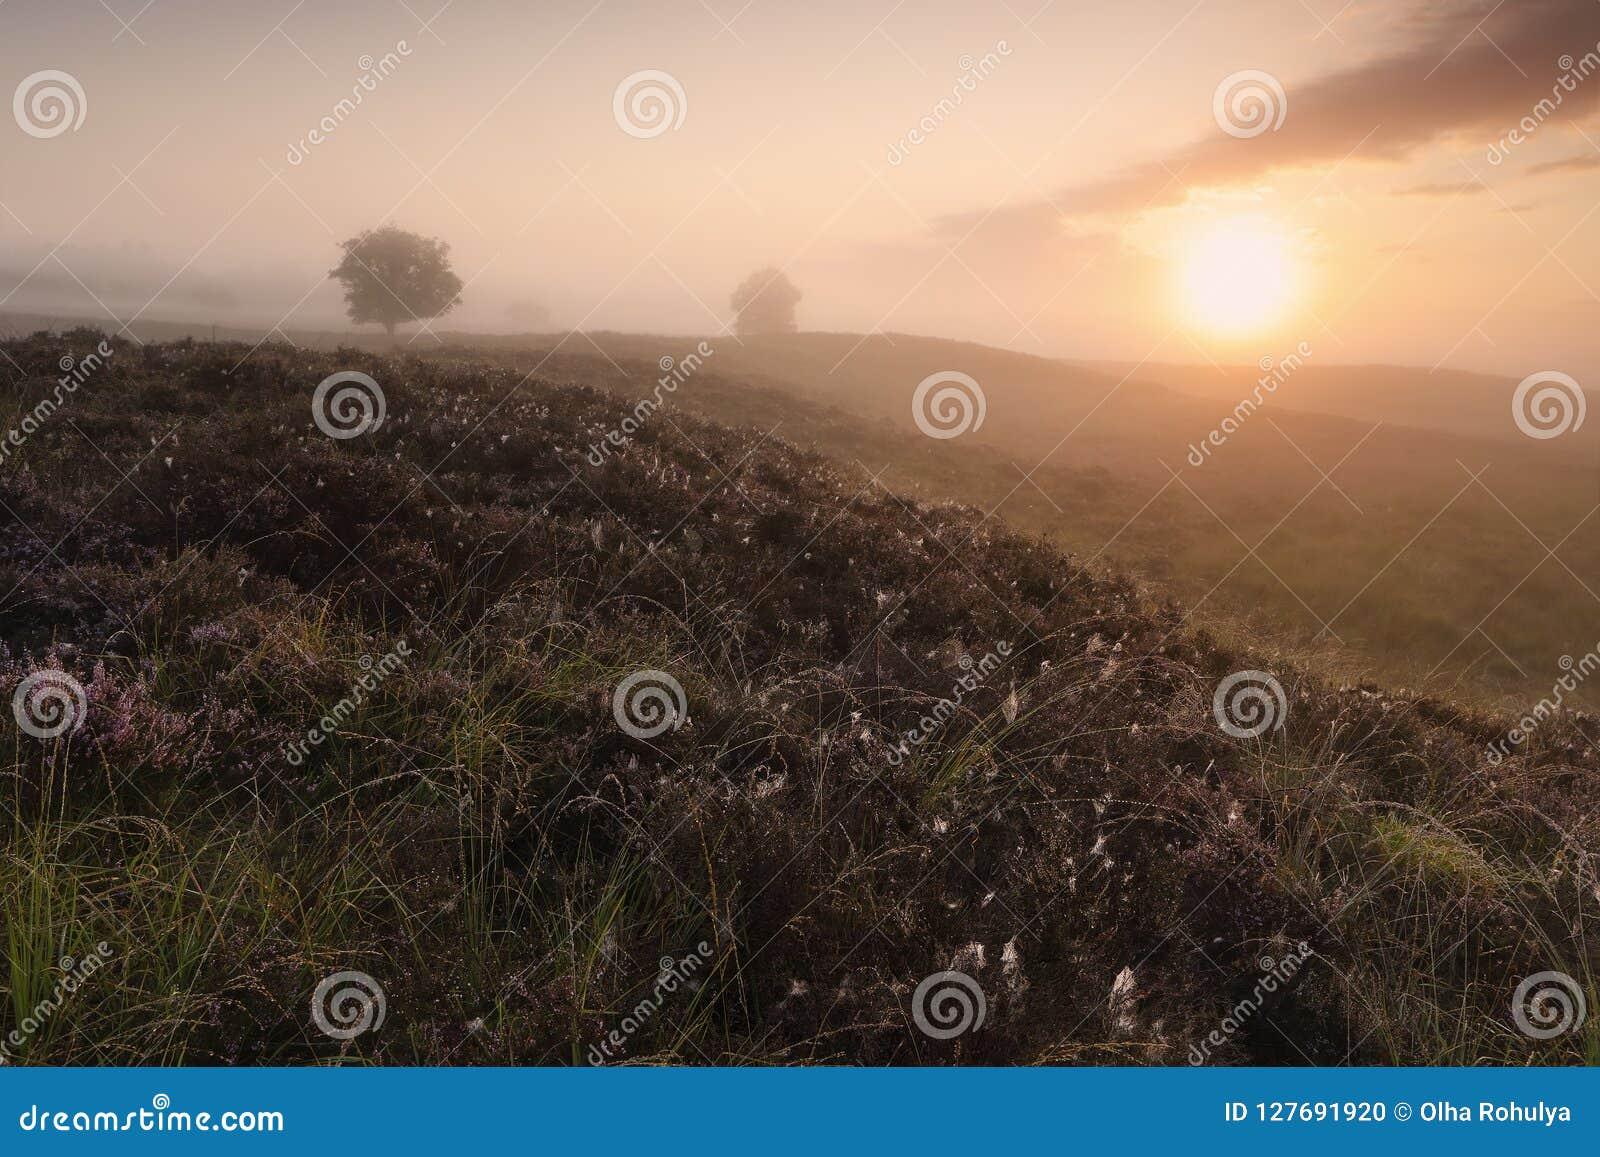 Beautiful misty sunrise over hills